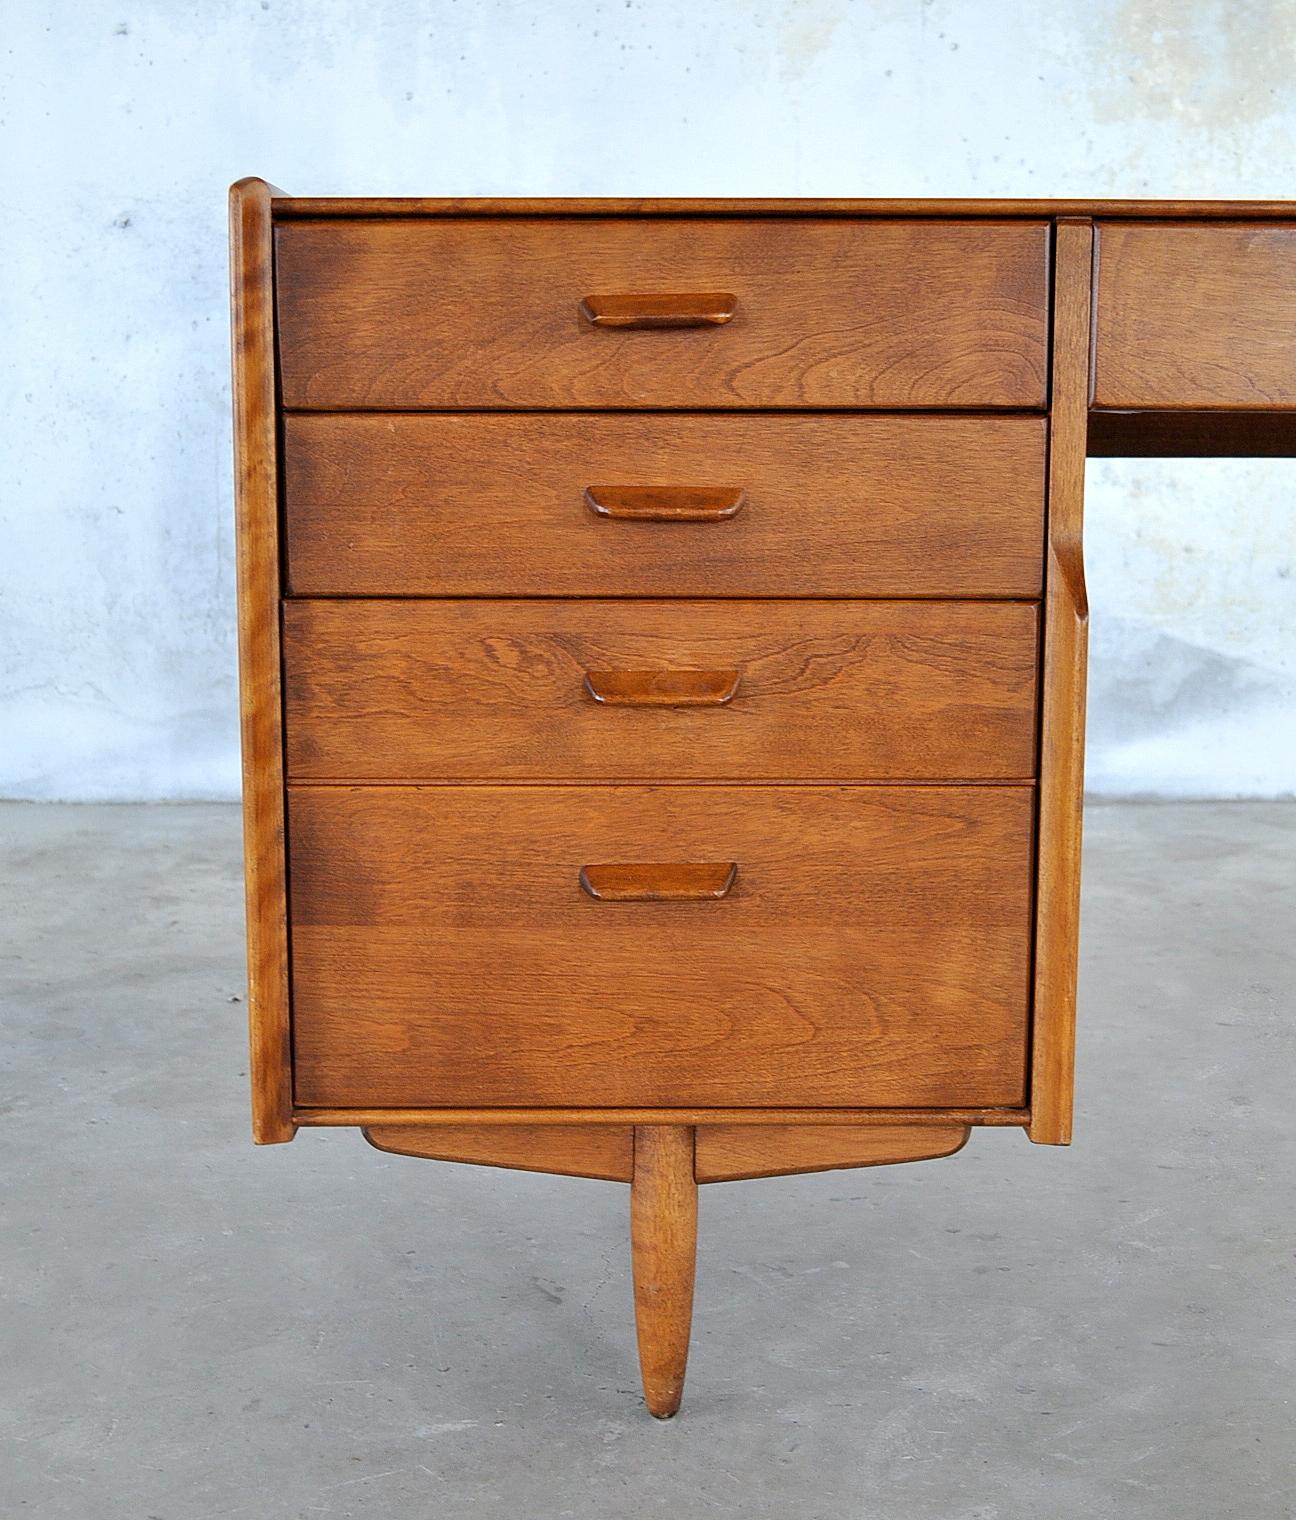 SELECT MODERN Russel Wright Desk